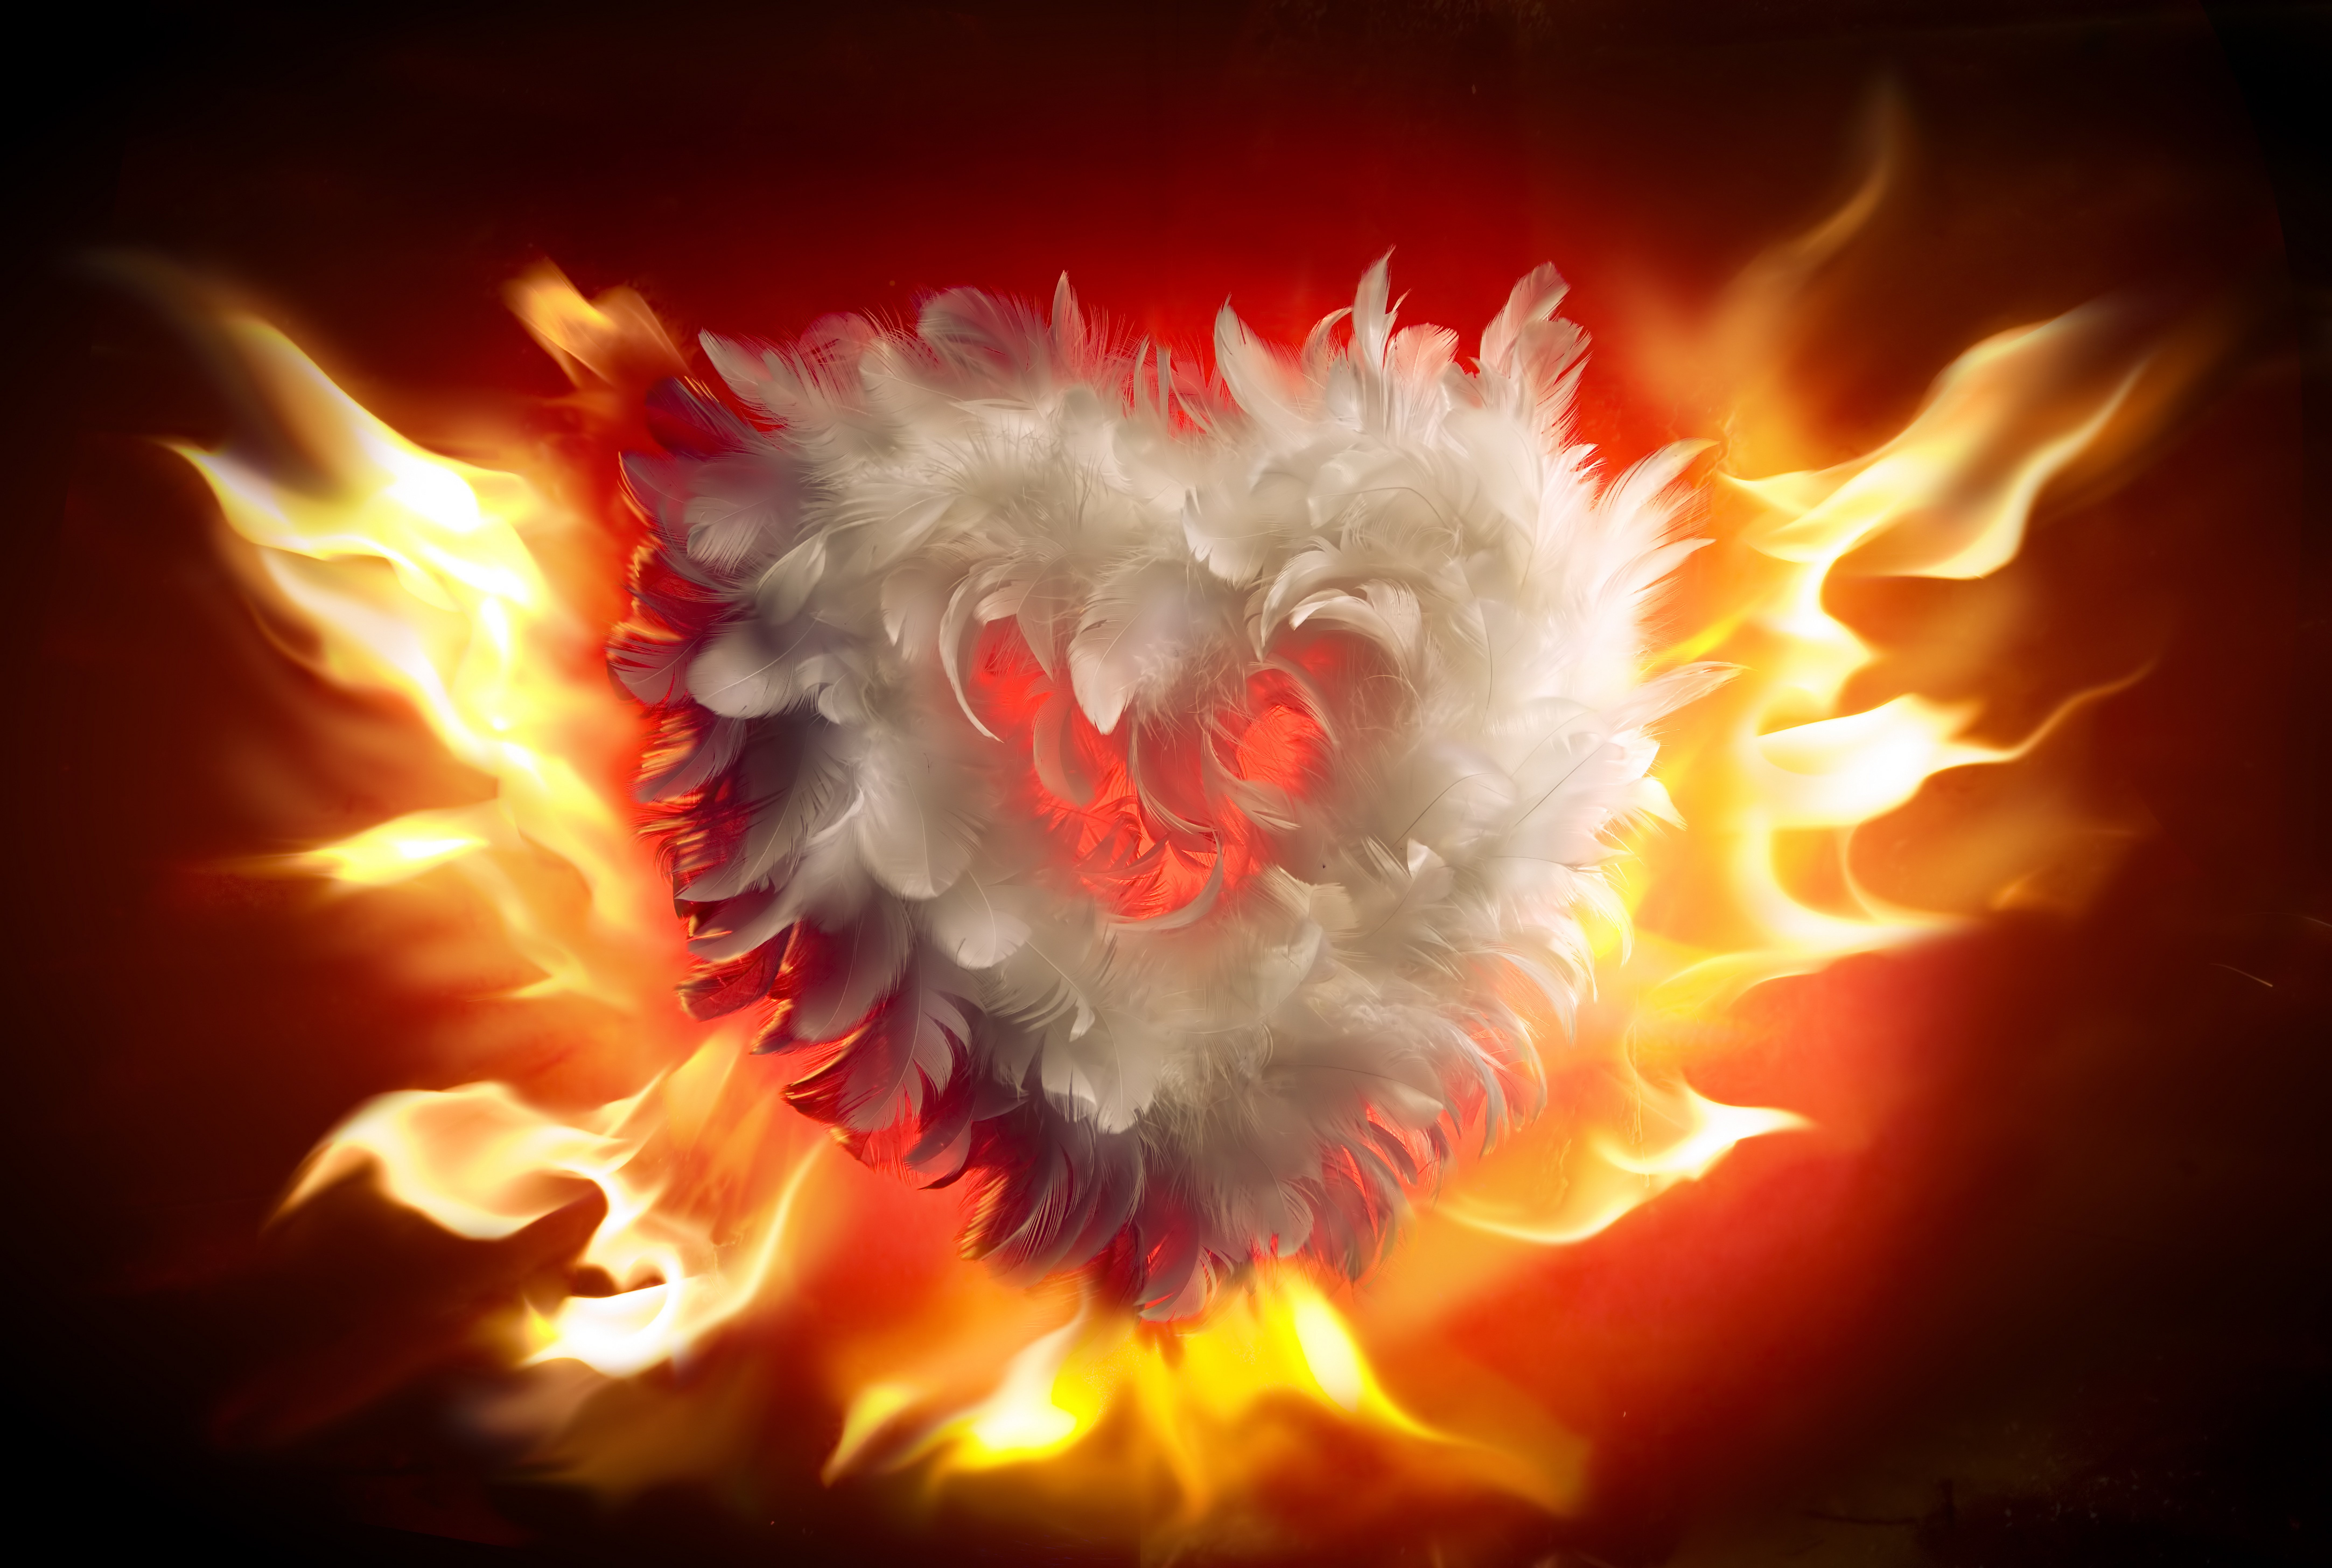 Arts fire valentines day heart love flames heart wallpaper 8662x5824